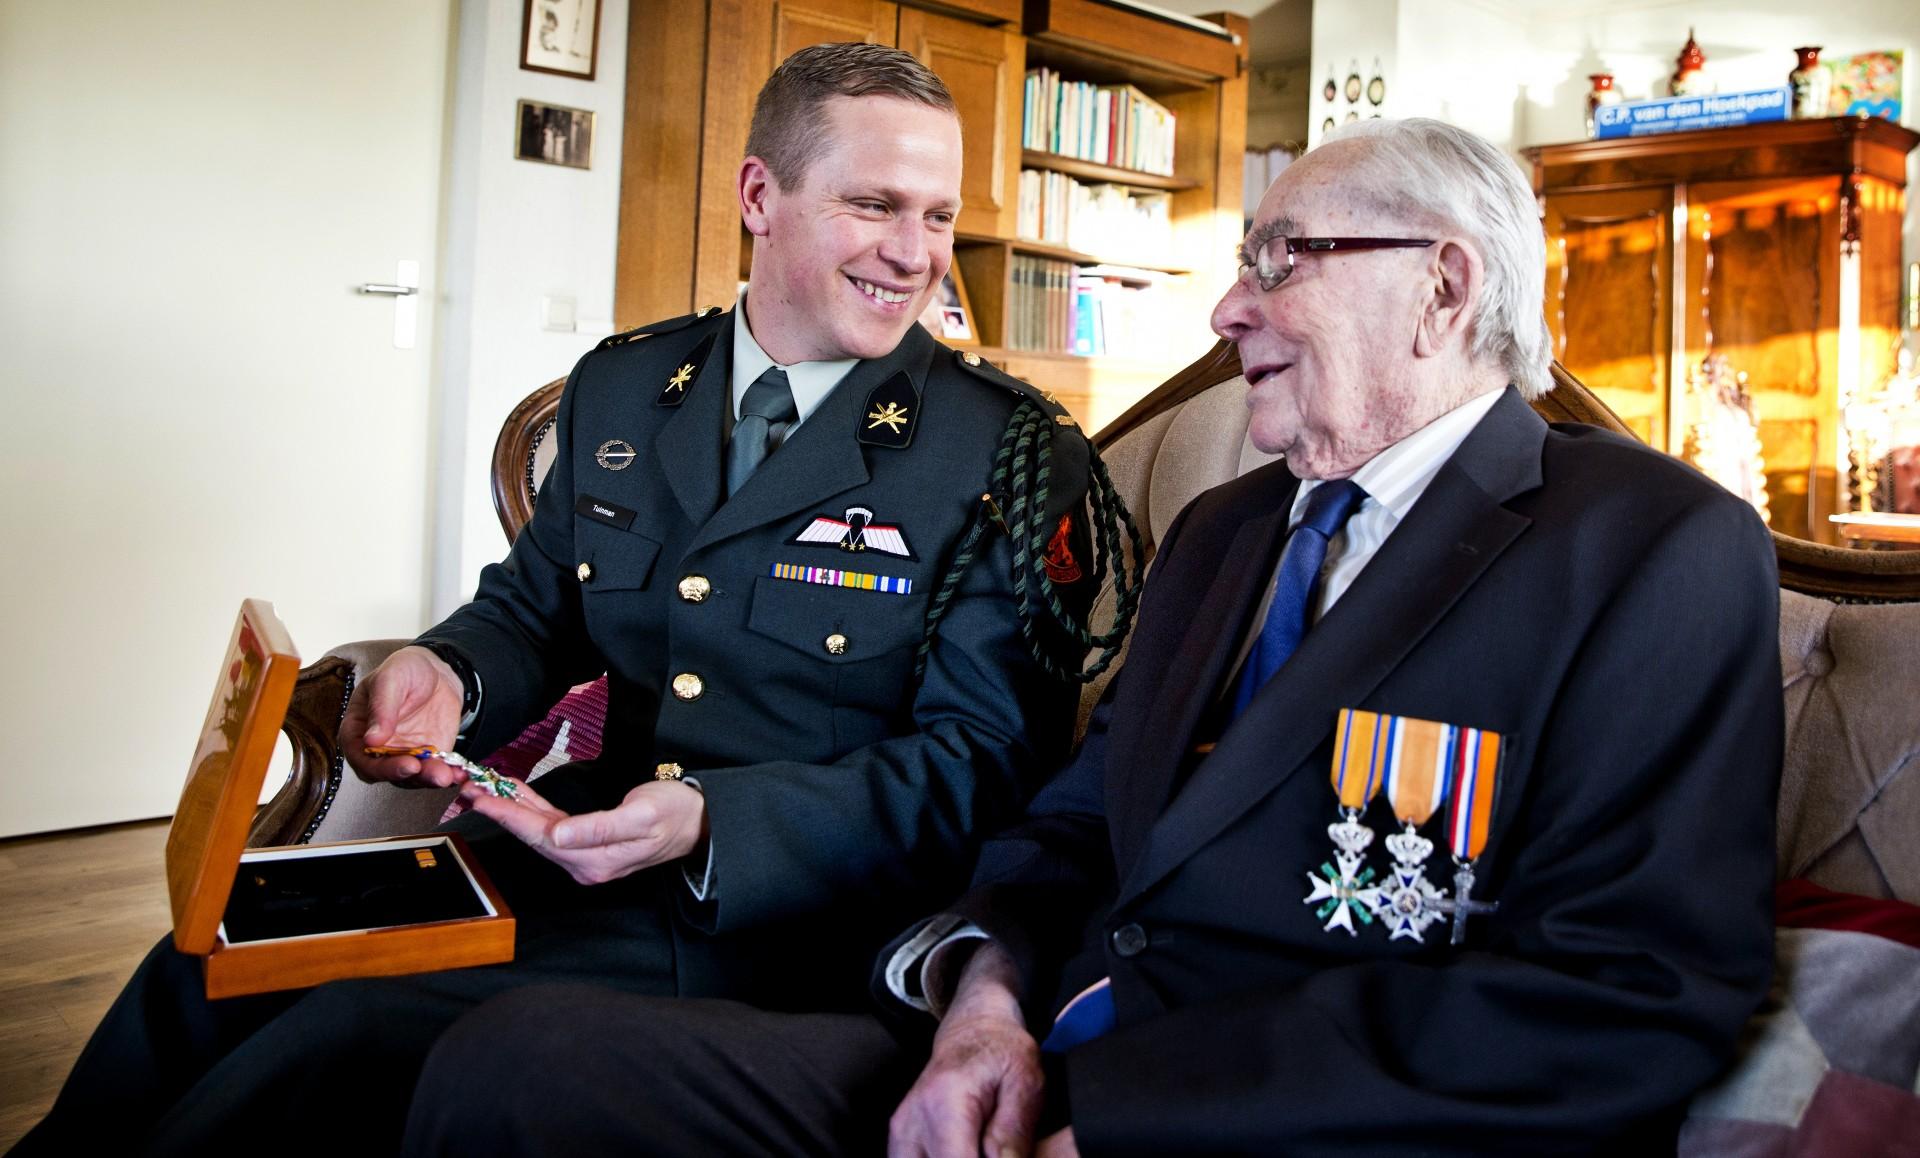 Ridders militaire Willems-Orde ontmoeten elkaar